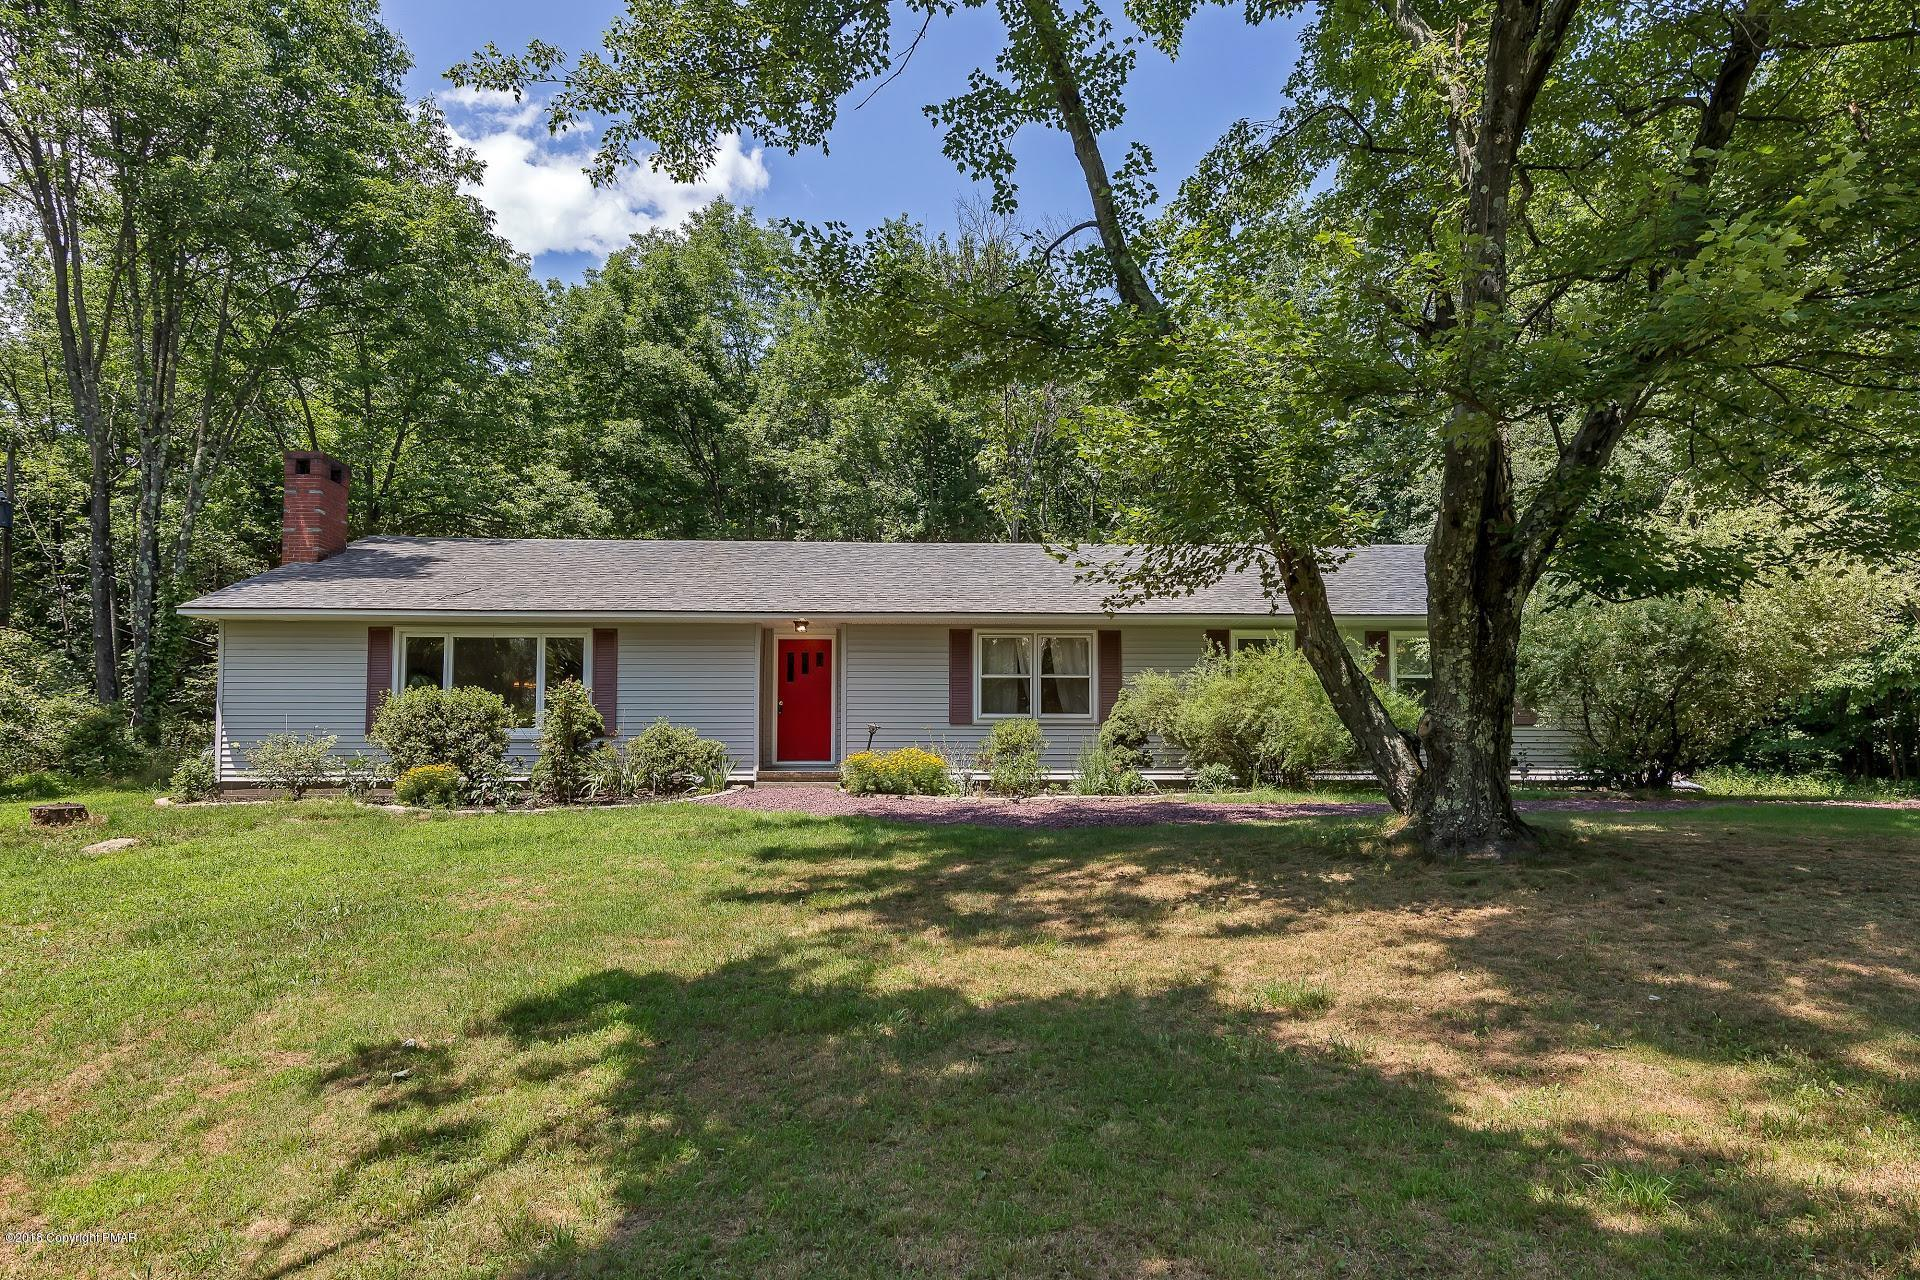 619 Fish Hill Rd, East Stroudsburg, PA 18301